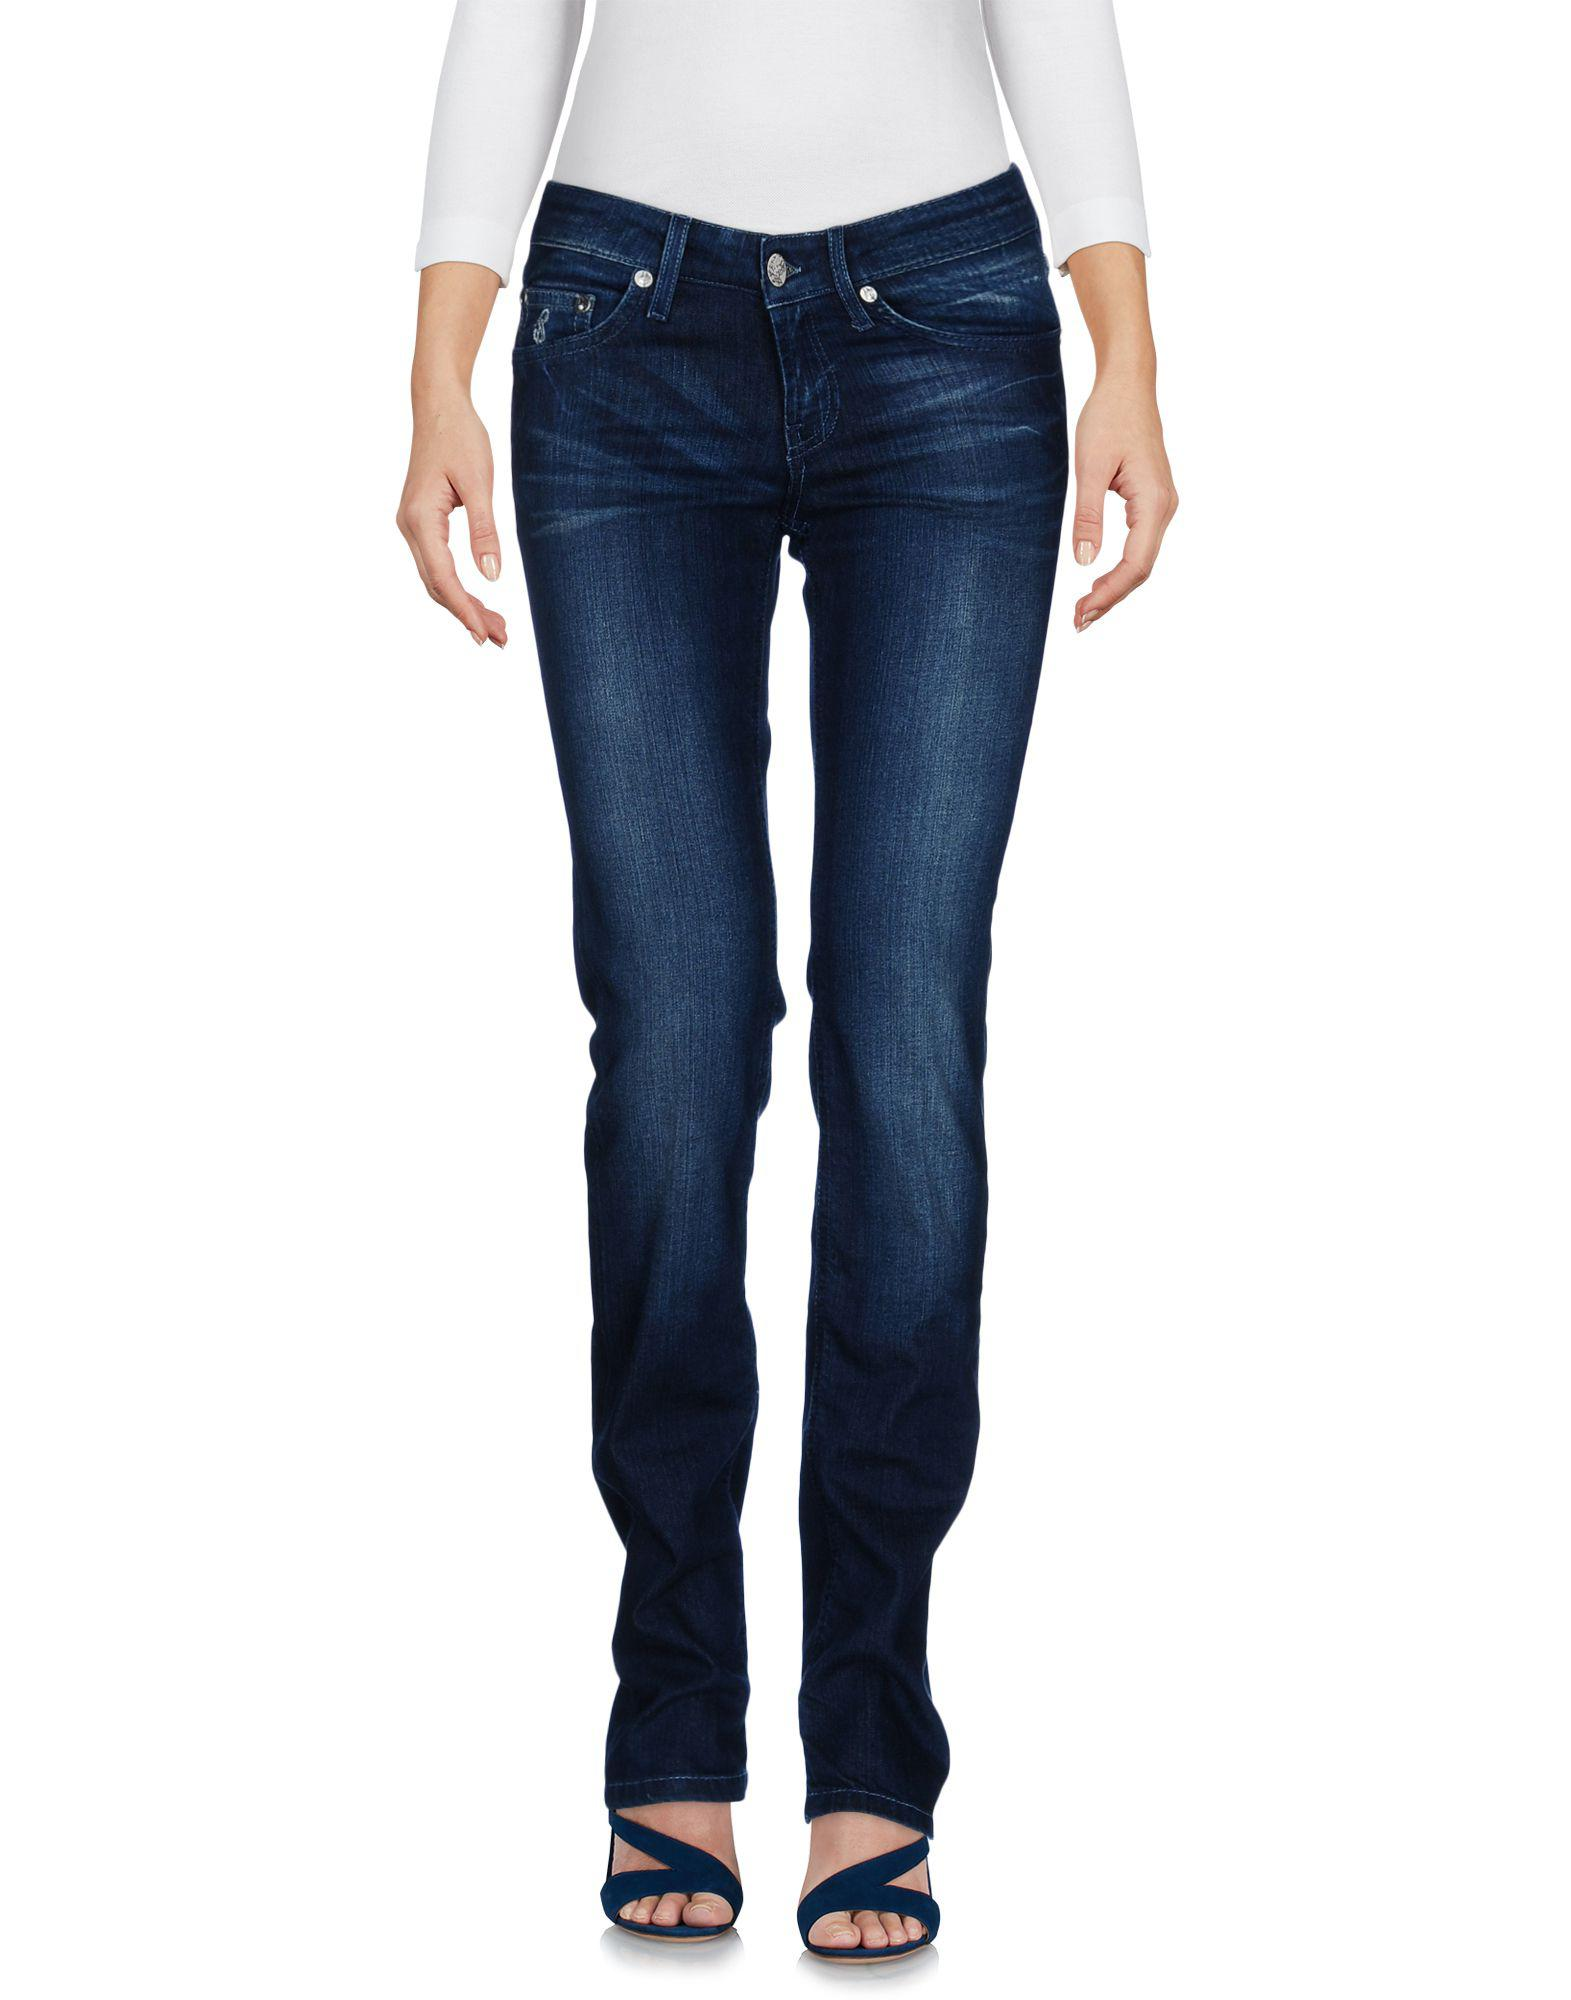 DENIM - Denim trousers Seven 7 Cheapest Price Cheap Price Ozn5WZarYZ